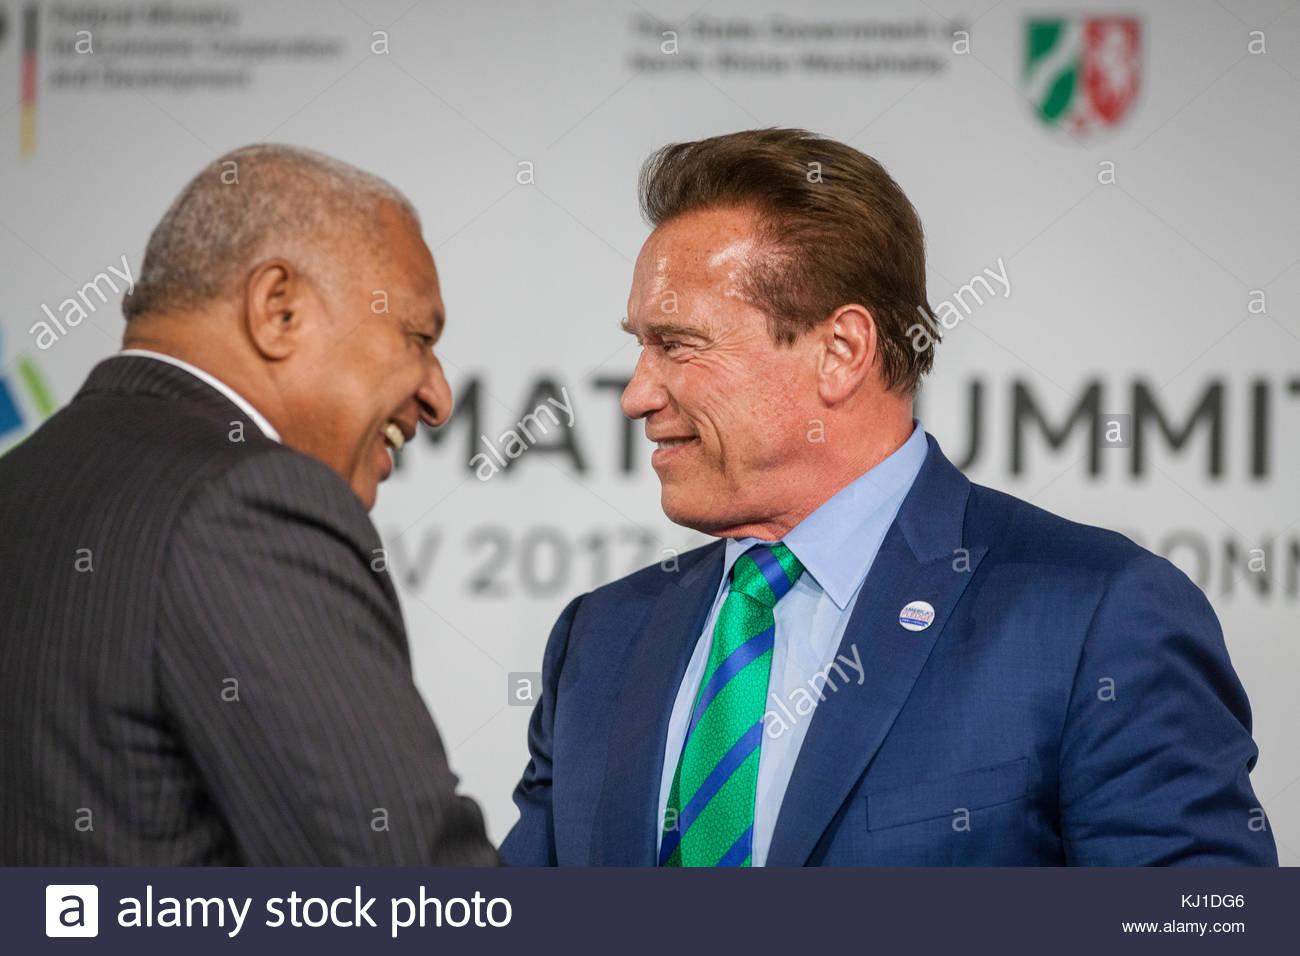 Bonn, DEU, 12.11.2017  Premierminister Frank Bainimarama (Fidschi) und Arnold Schwarzenegger beim Climate Summit - Stock Image